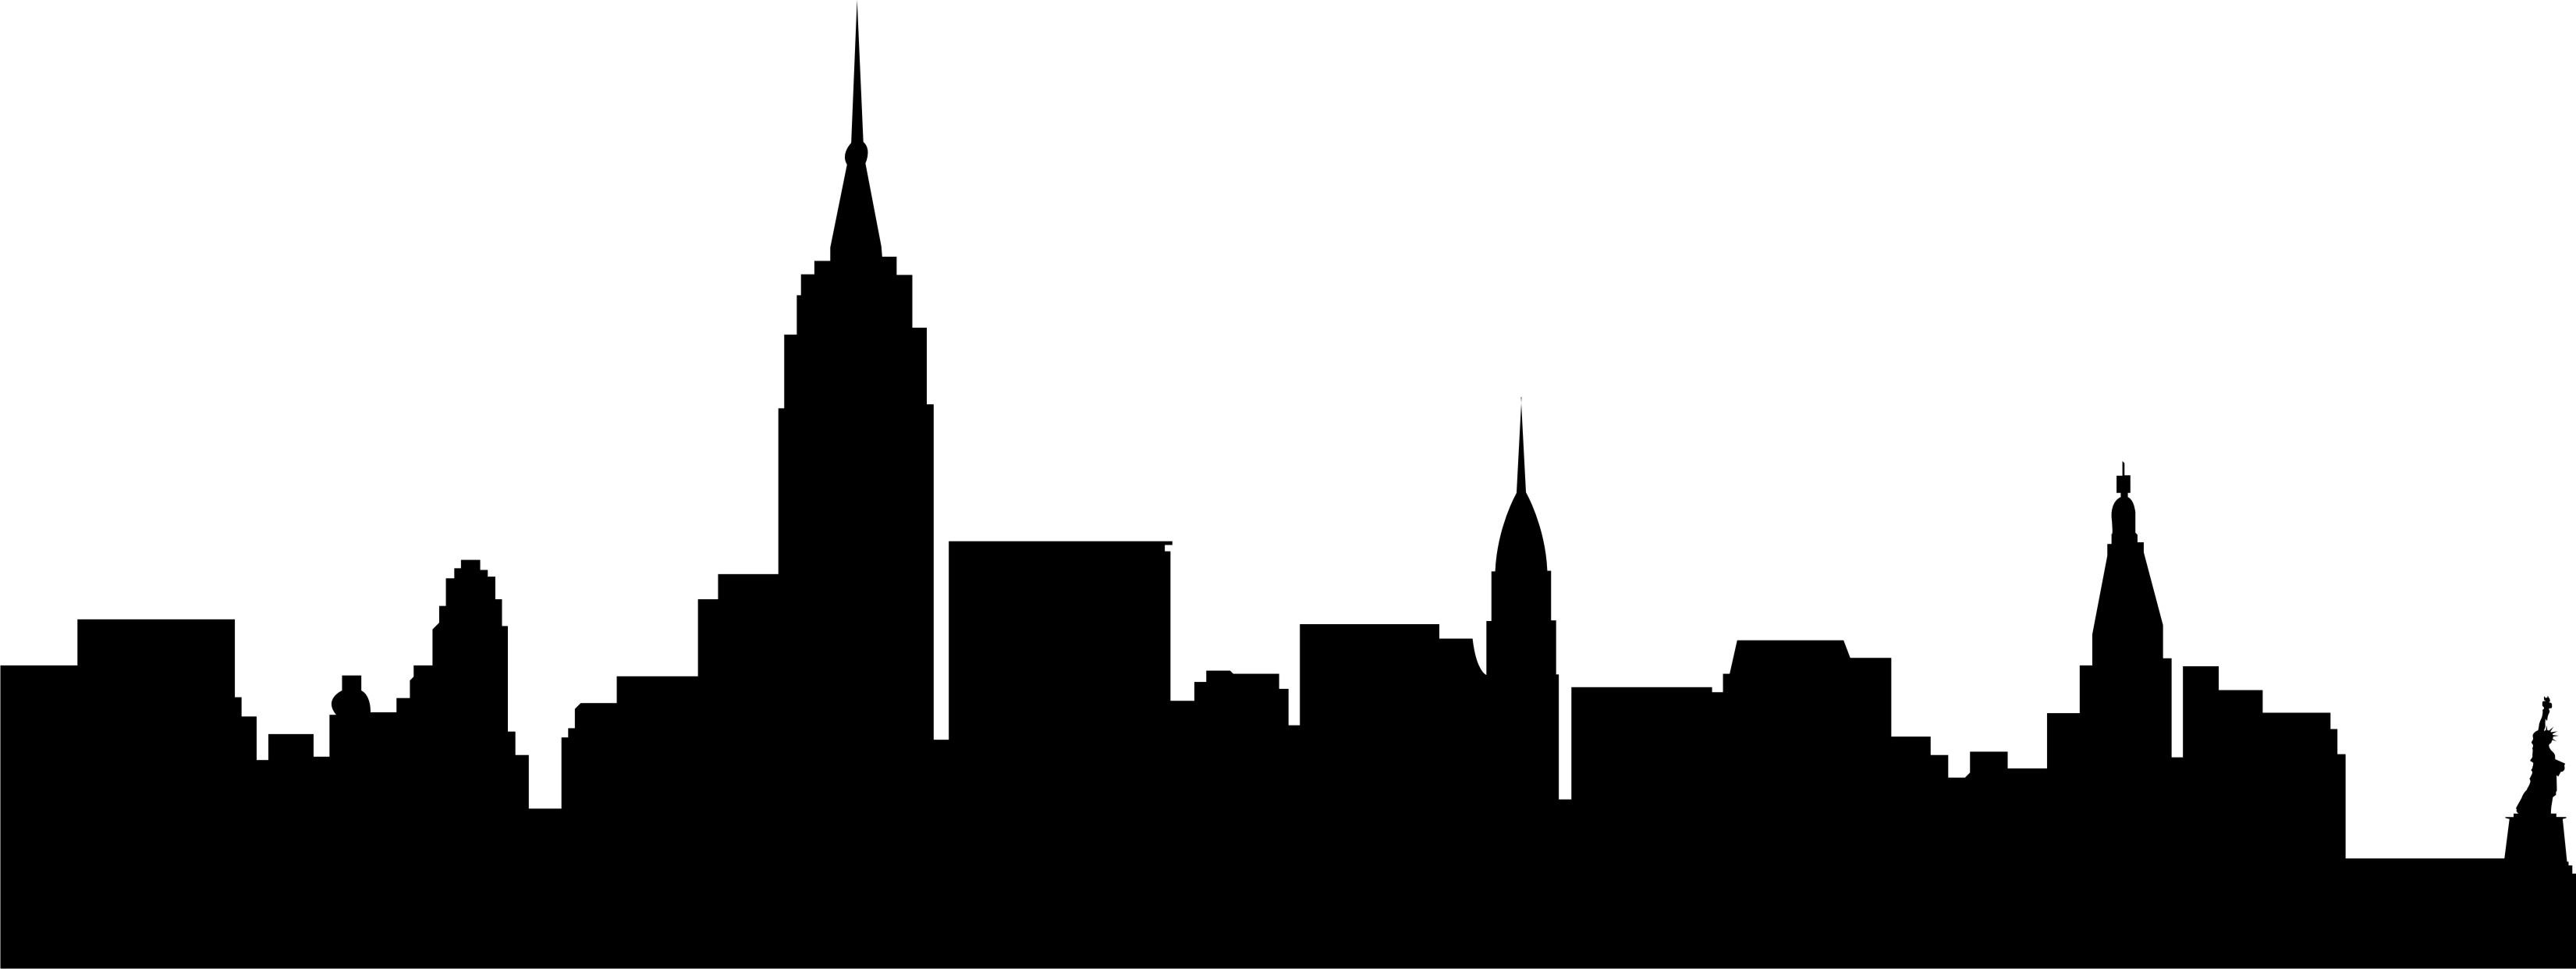 new york city clipart .-new york city clipart .-17